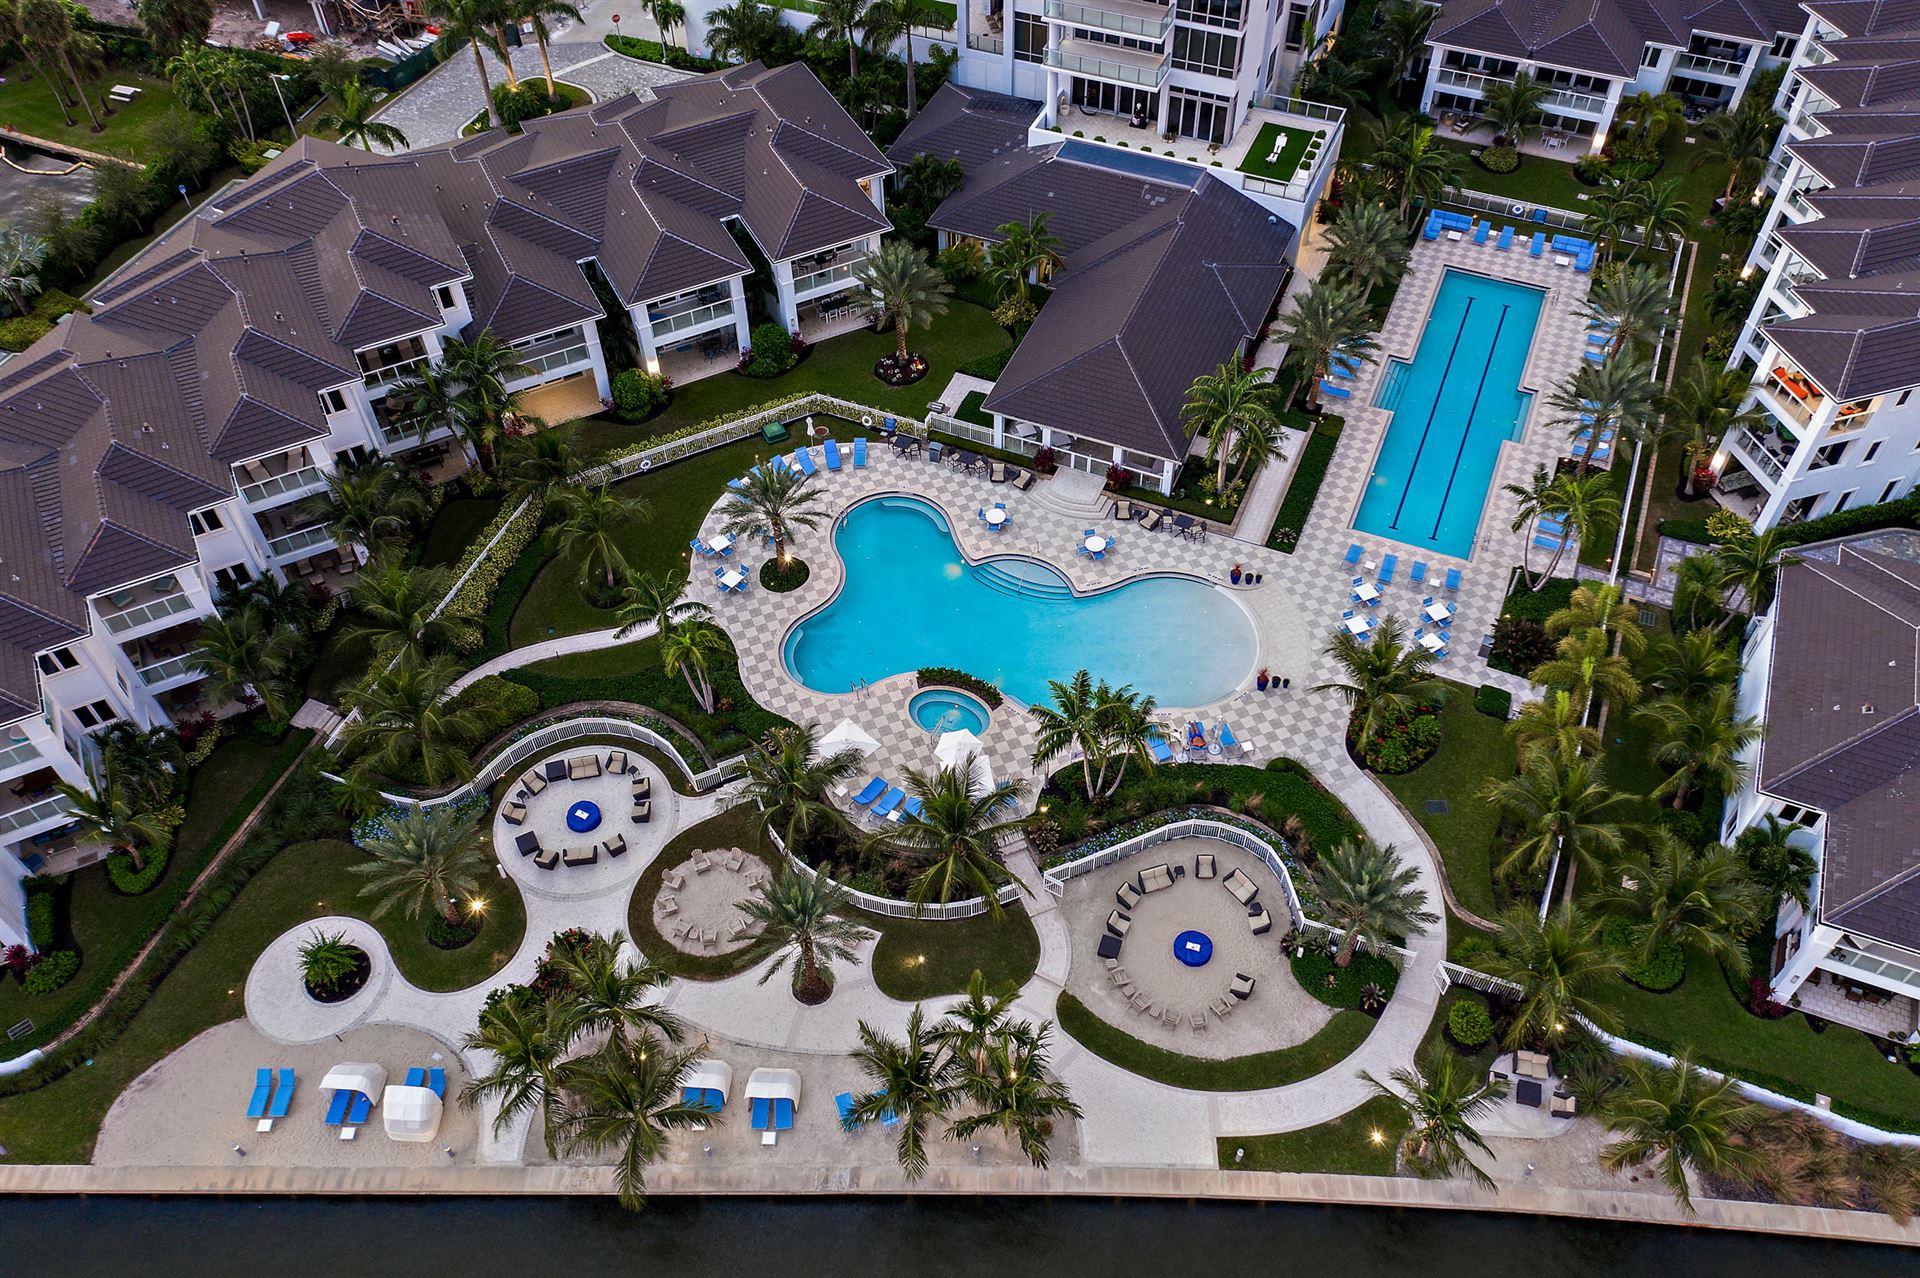 Photo of 2 Water Club Way #904, North Palm Beach, FL 33408 (MLS # RX-10638145)